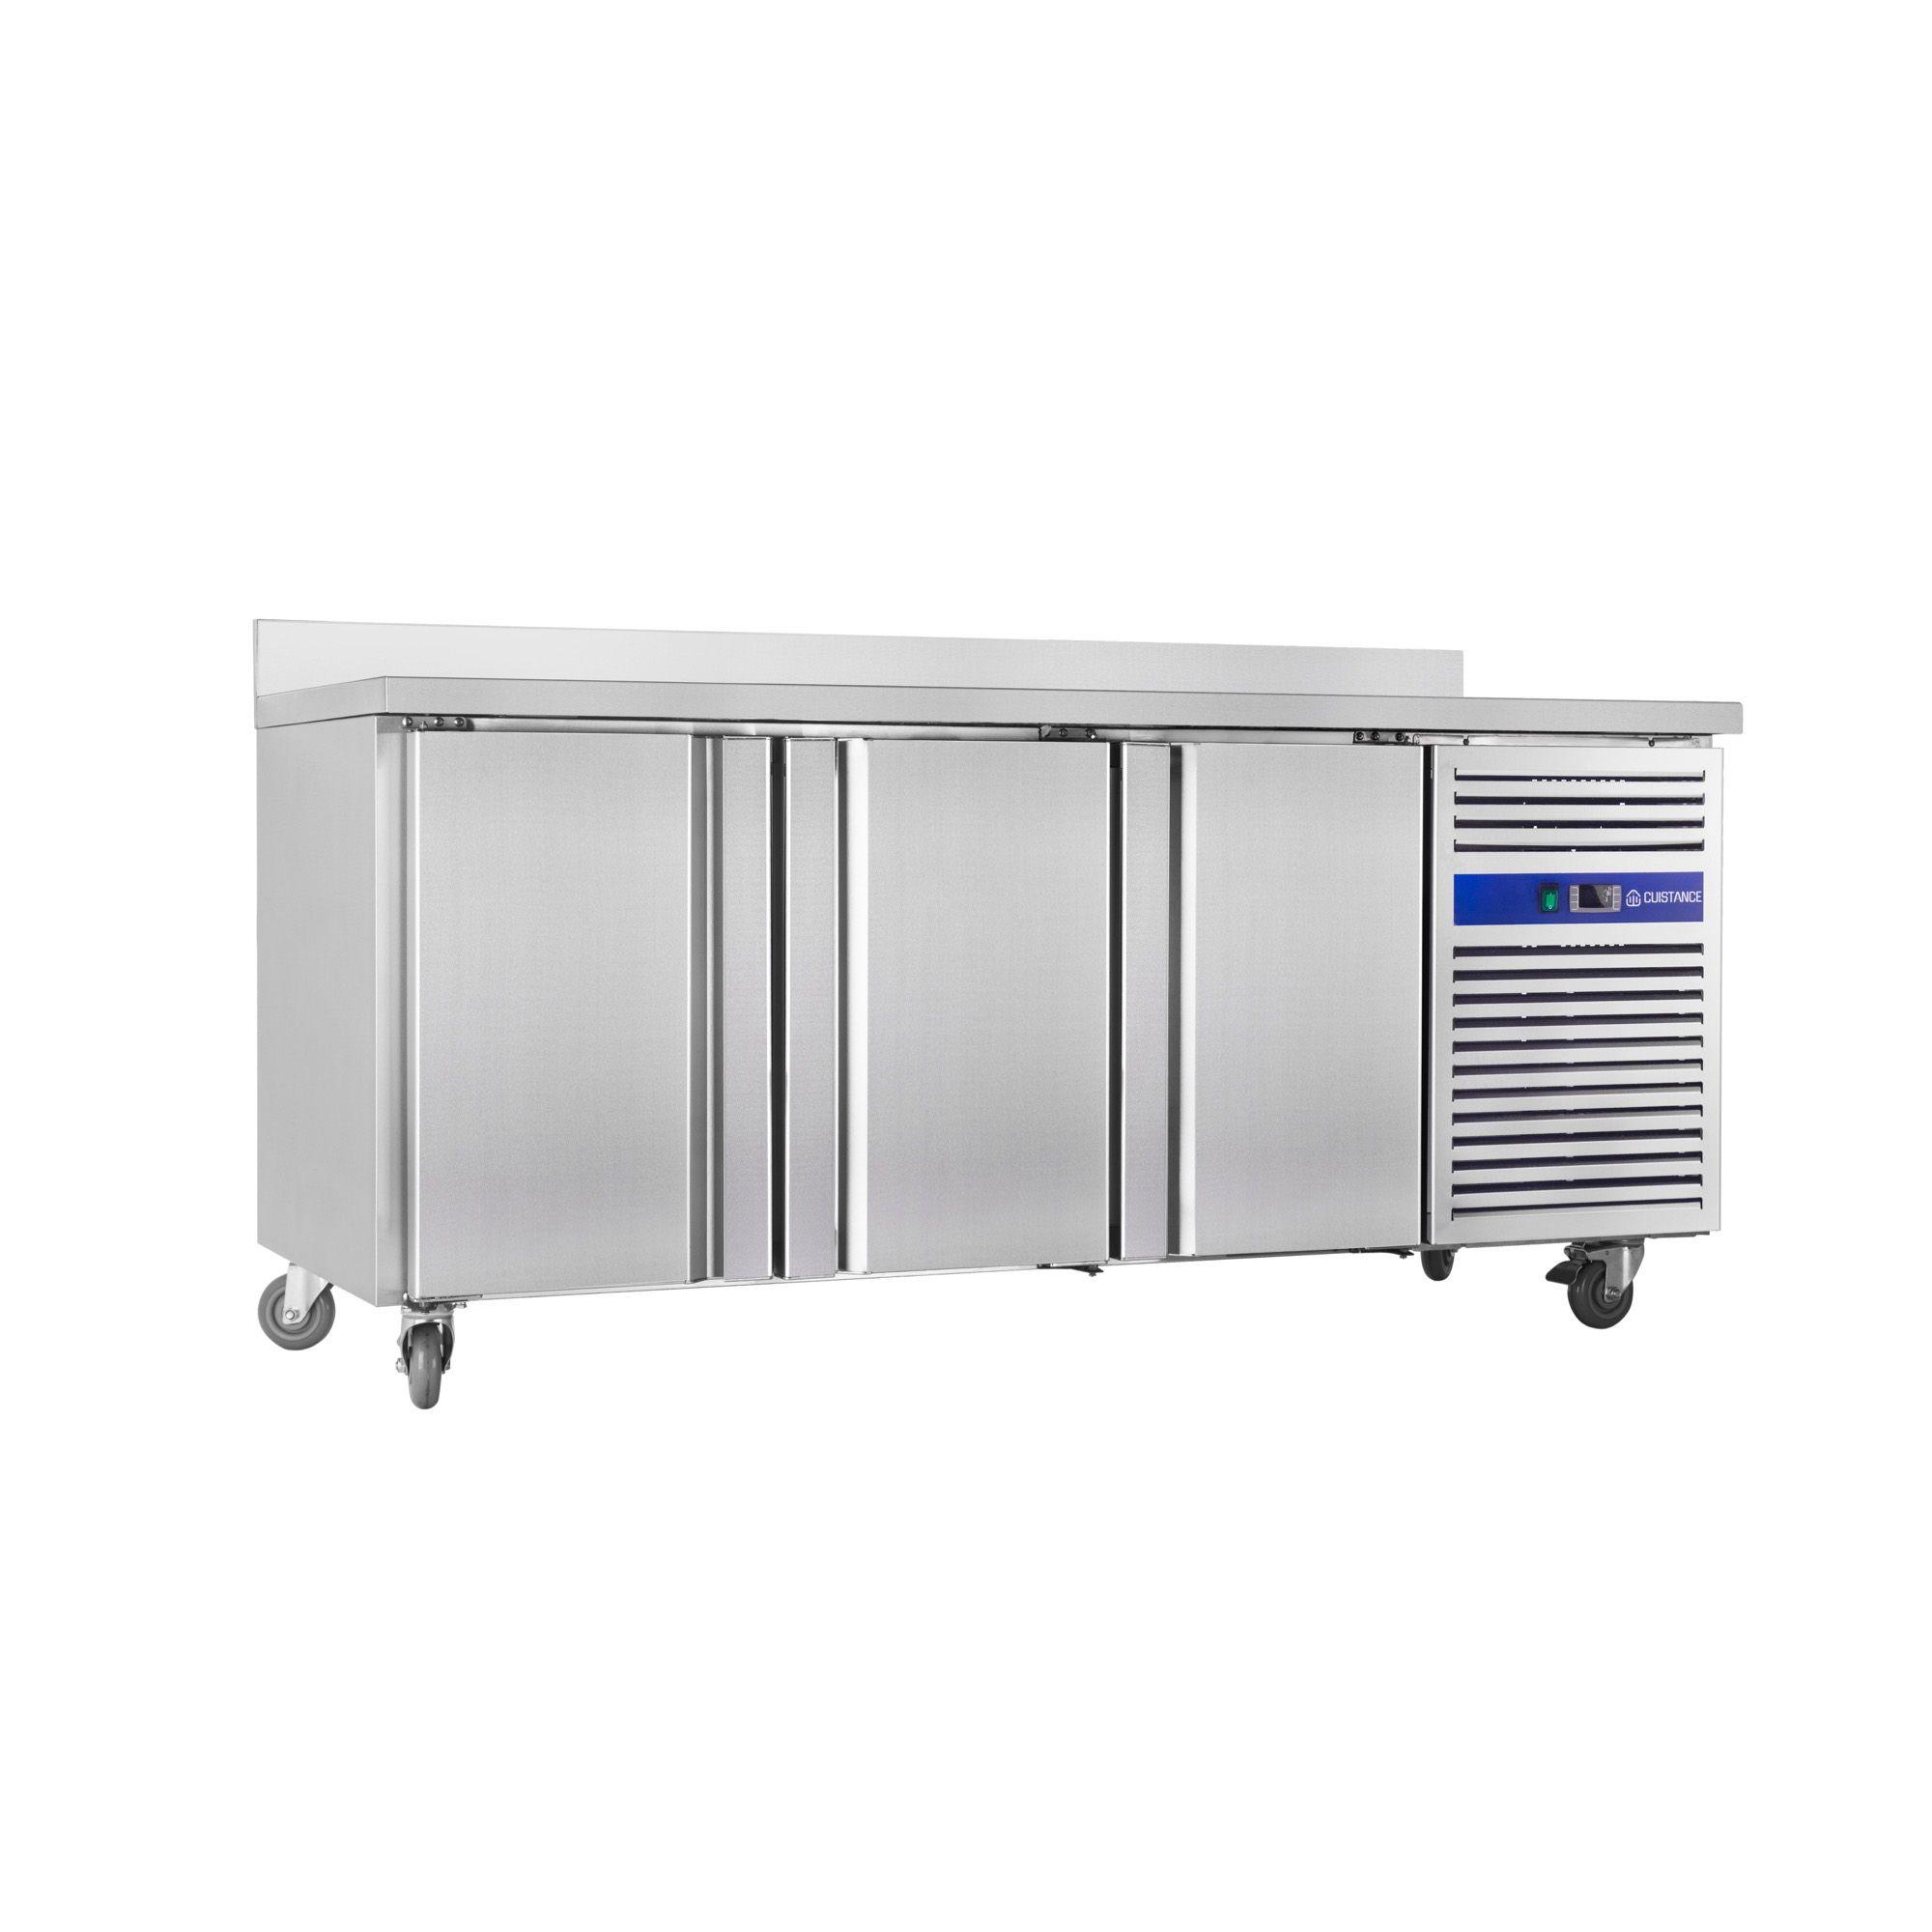 Cuistance Desserte Refrigeree 600 En Inox Adosse 3 Portes Positive En 2020 Degivrage Meuble Inox